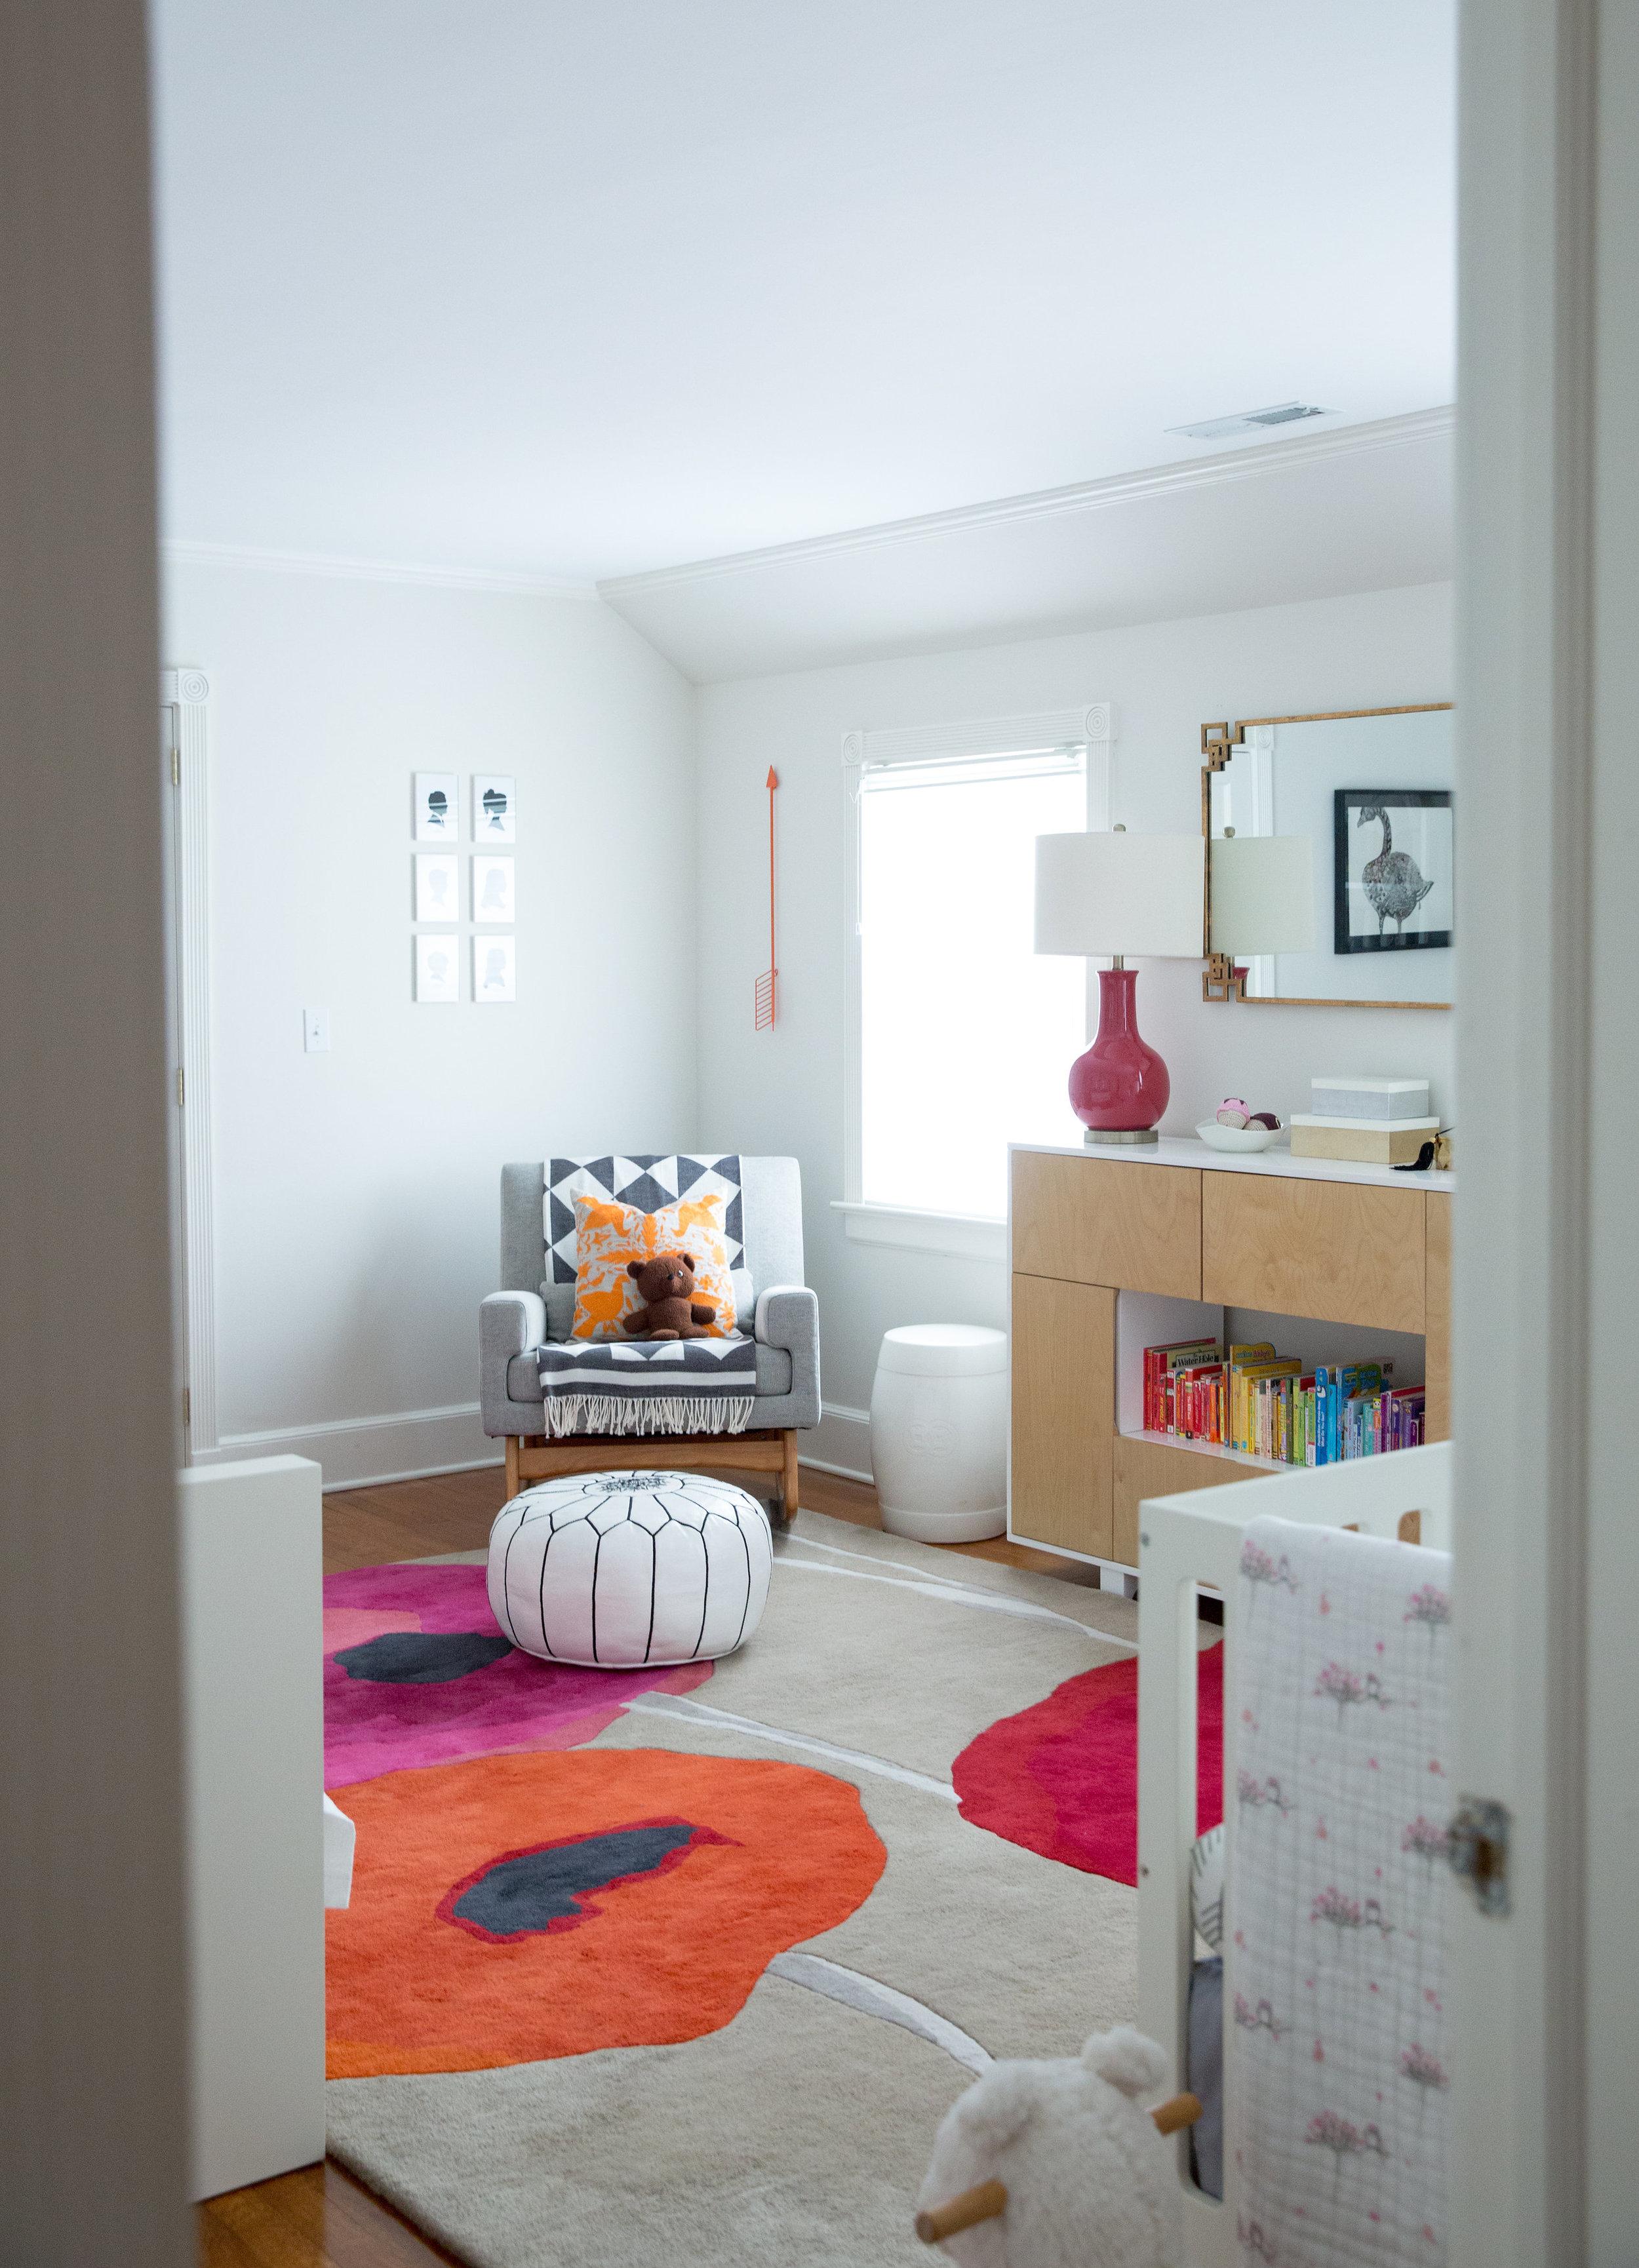 Ceci_Johnson_Welcome_Baby_Elle_Hazel_Johnson_Nursery_Tour_Design_Baby_Product_Pick_kid_Ana_Schechter_newborn_photography_30.jpg